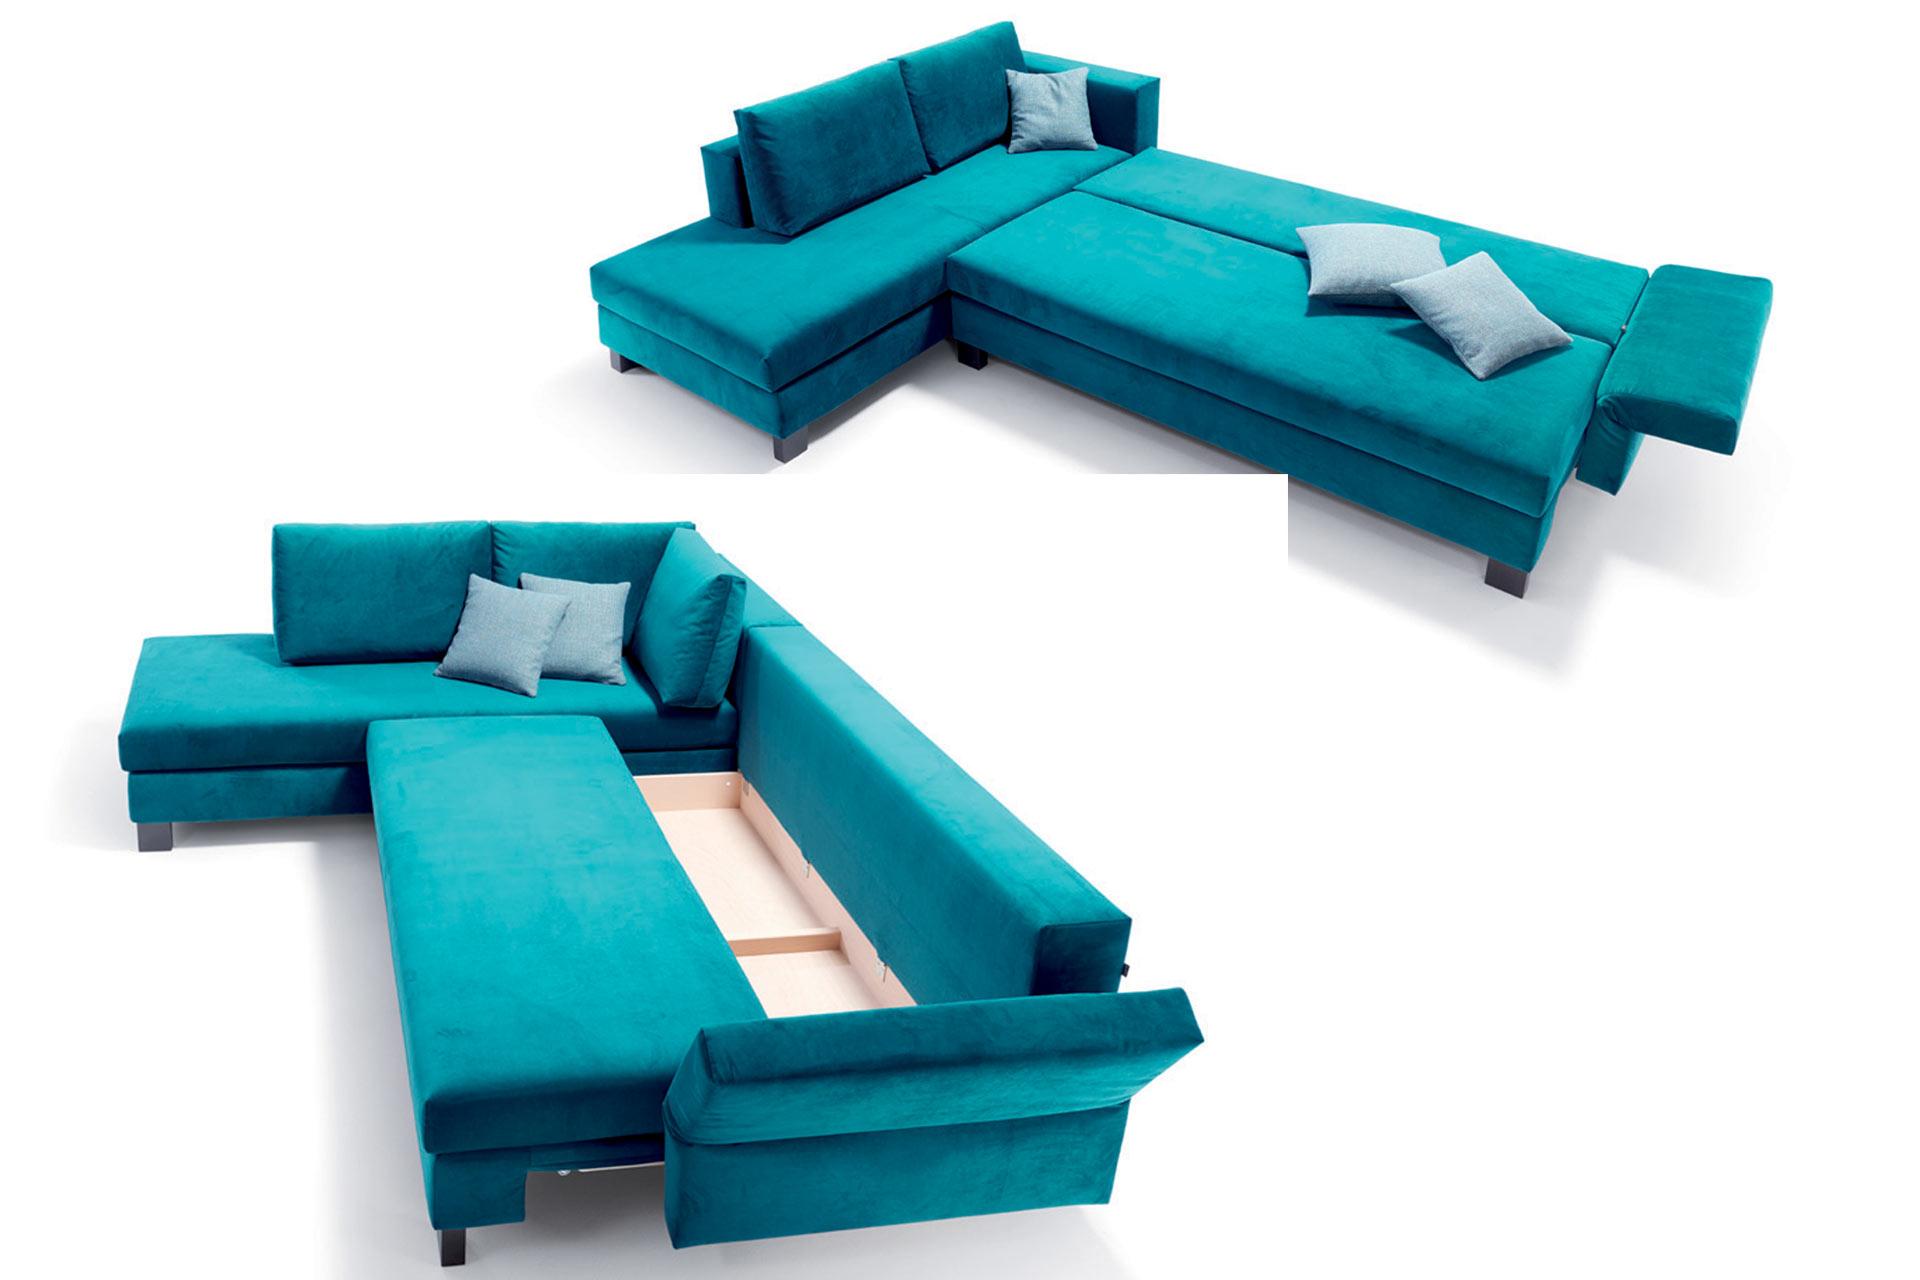 Full Size of Goodlife Sofa Signet Good Life Love Malaysia Amazon Couch Furniture Schlafposition Mit Open End Element Wohnopposition Berlin Echtleder Polyrattan Gelb Sofa Goodlife Sofa